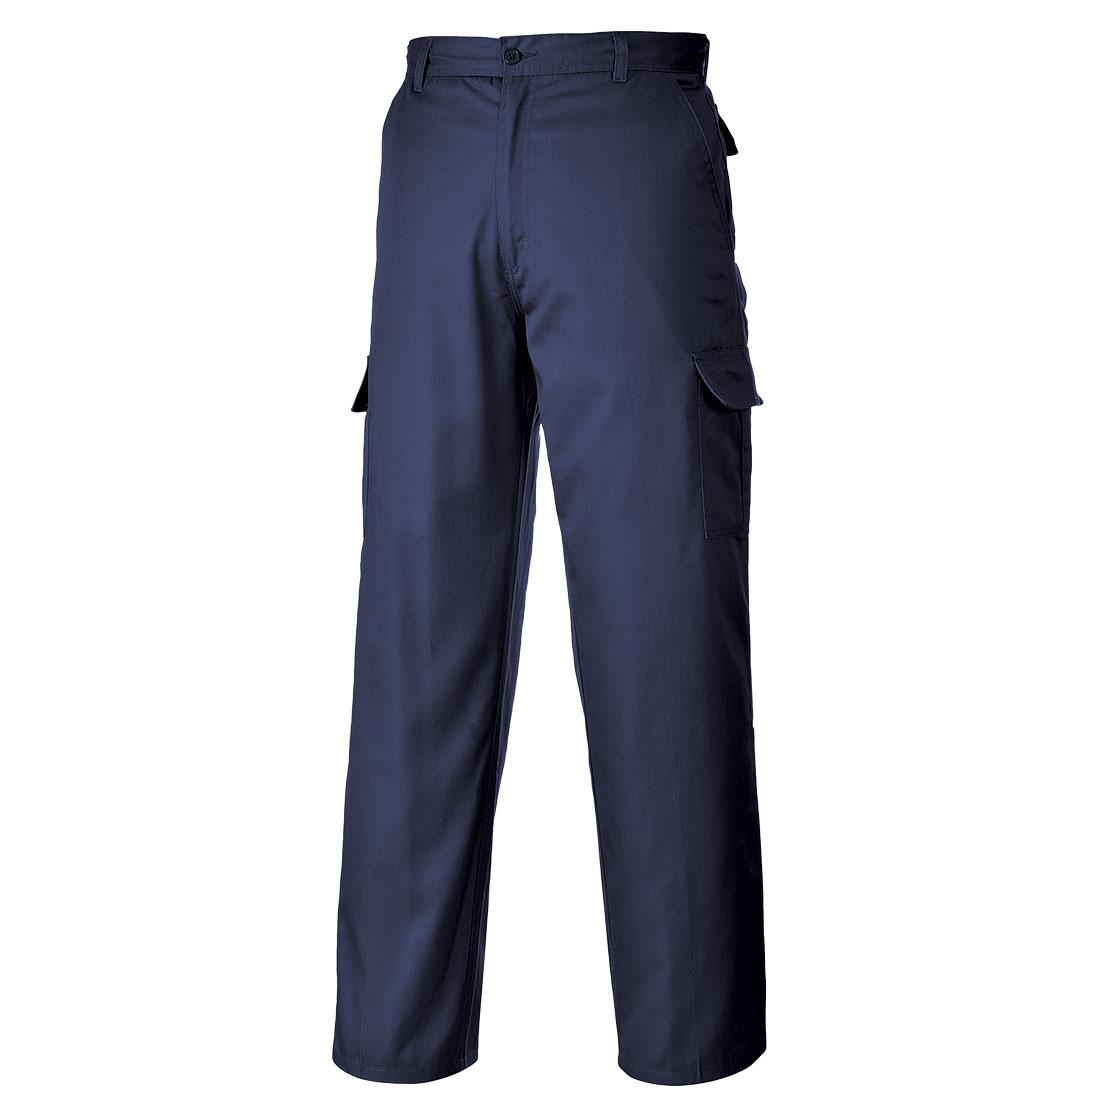 Combat Kneepad Trousers Navy 32R